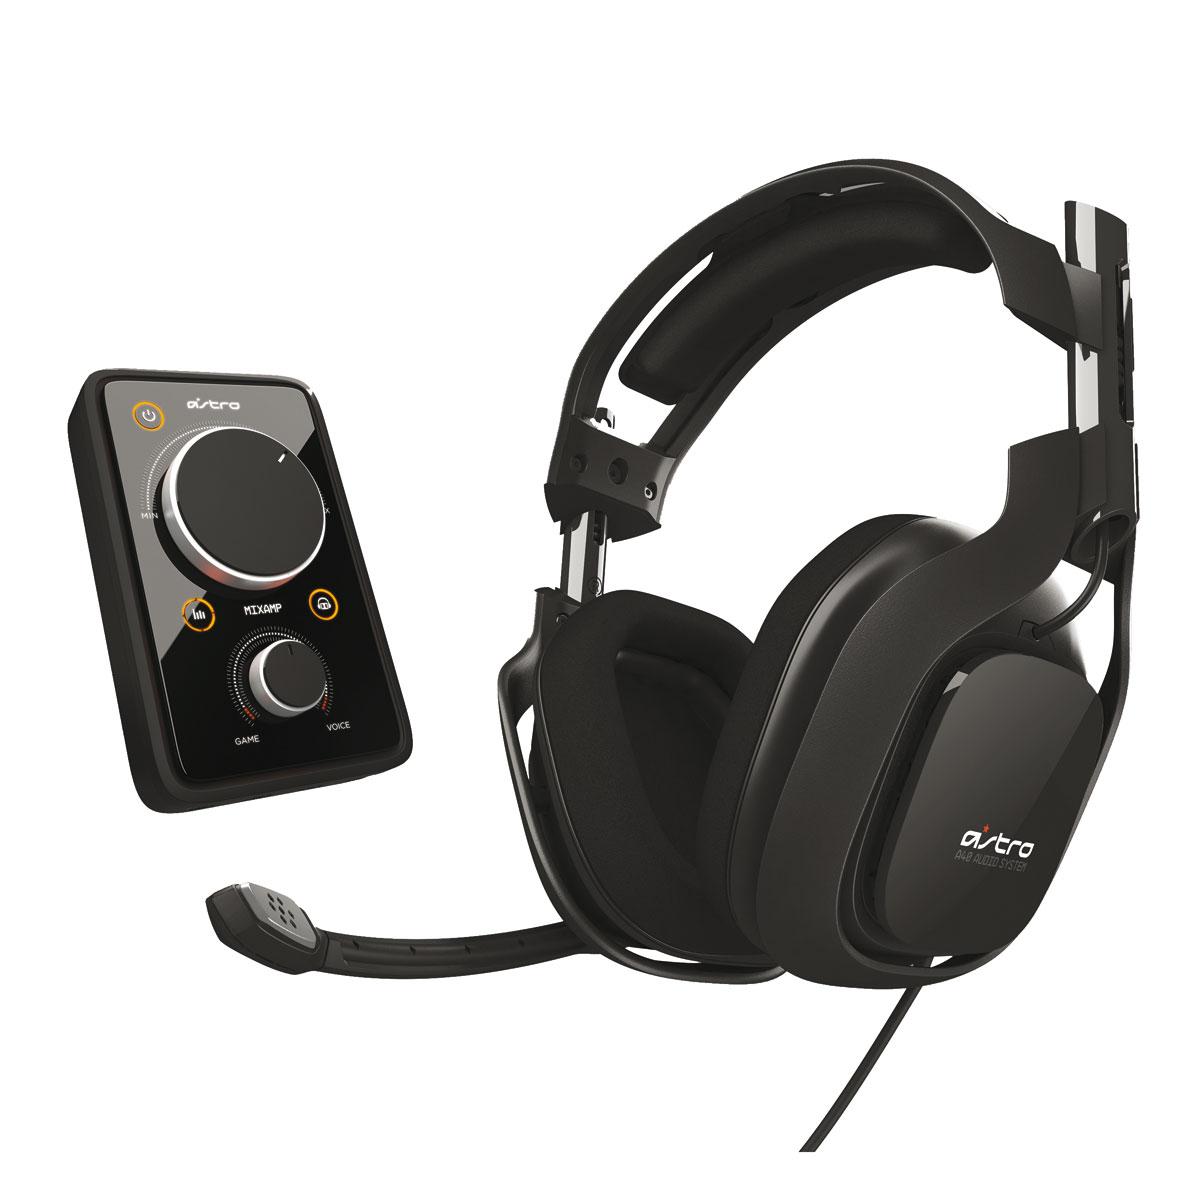 astro a40 noir ps4 ps3 xbox 360 pc accessoires xbox. Black Bedroom Furniture Sets. Home Design Ideas